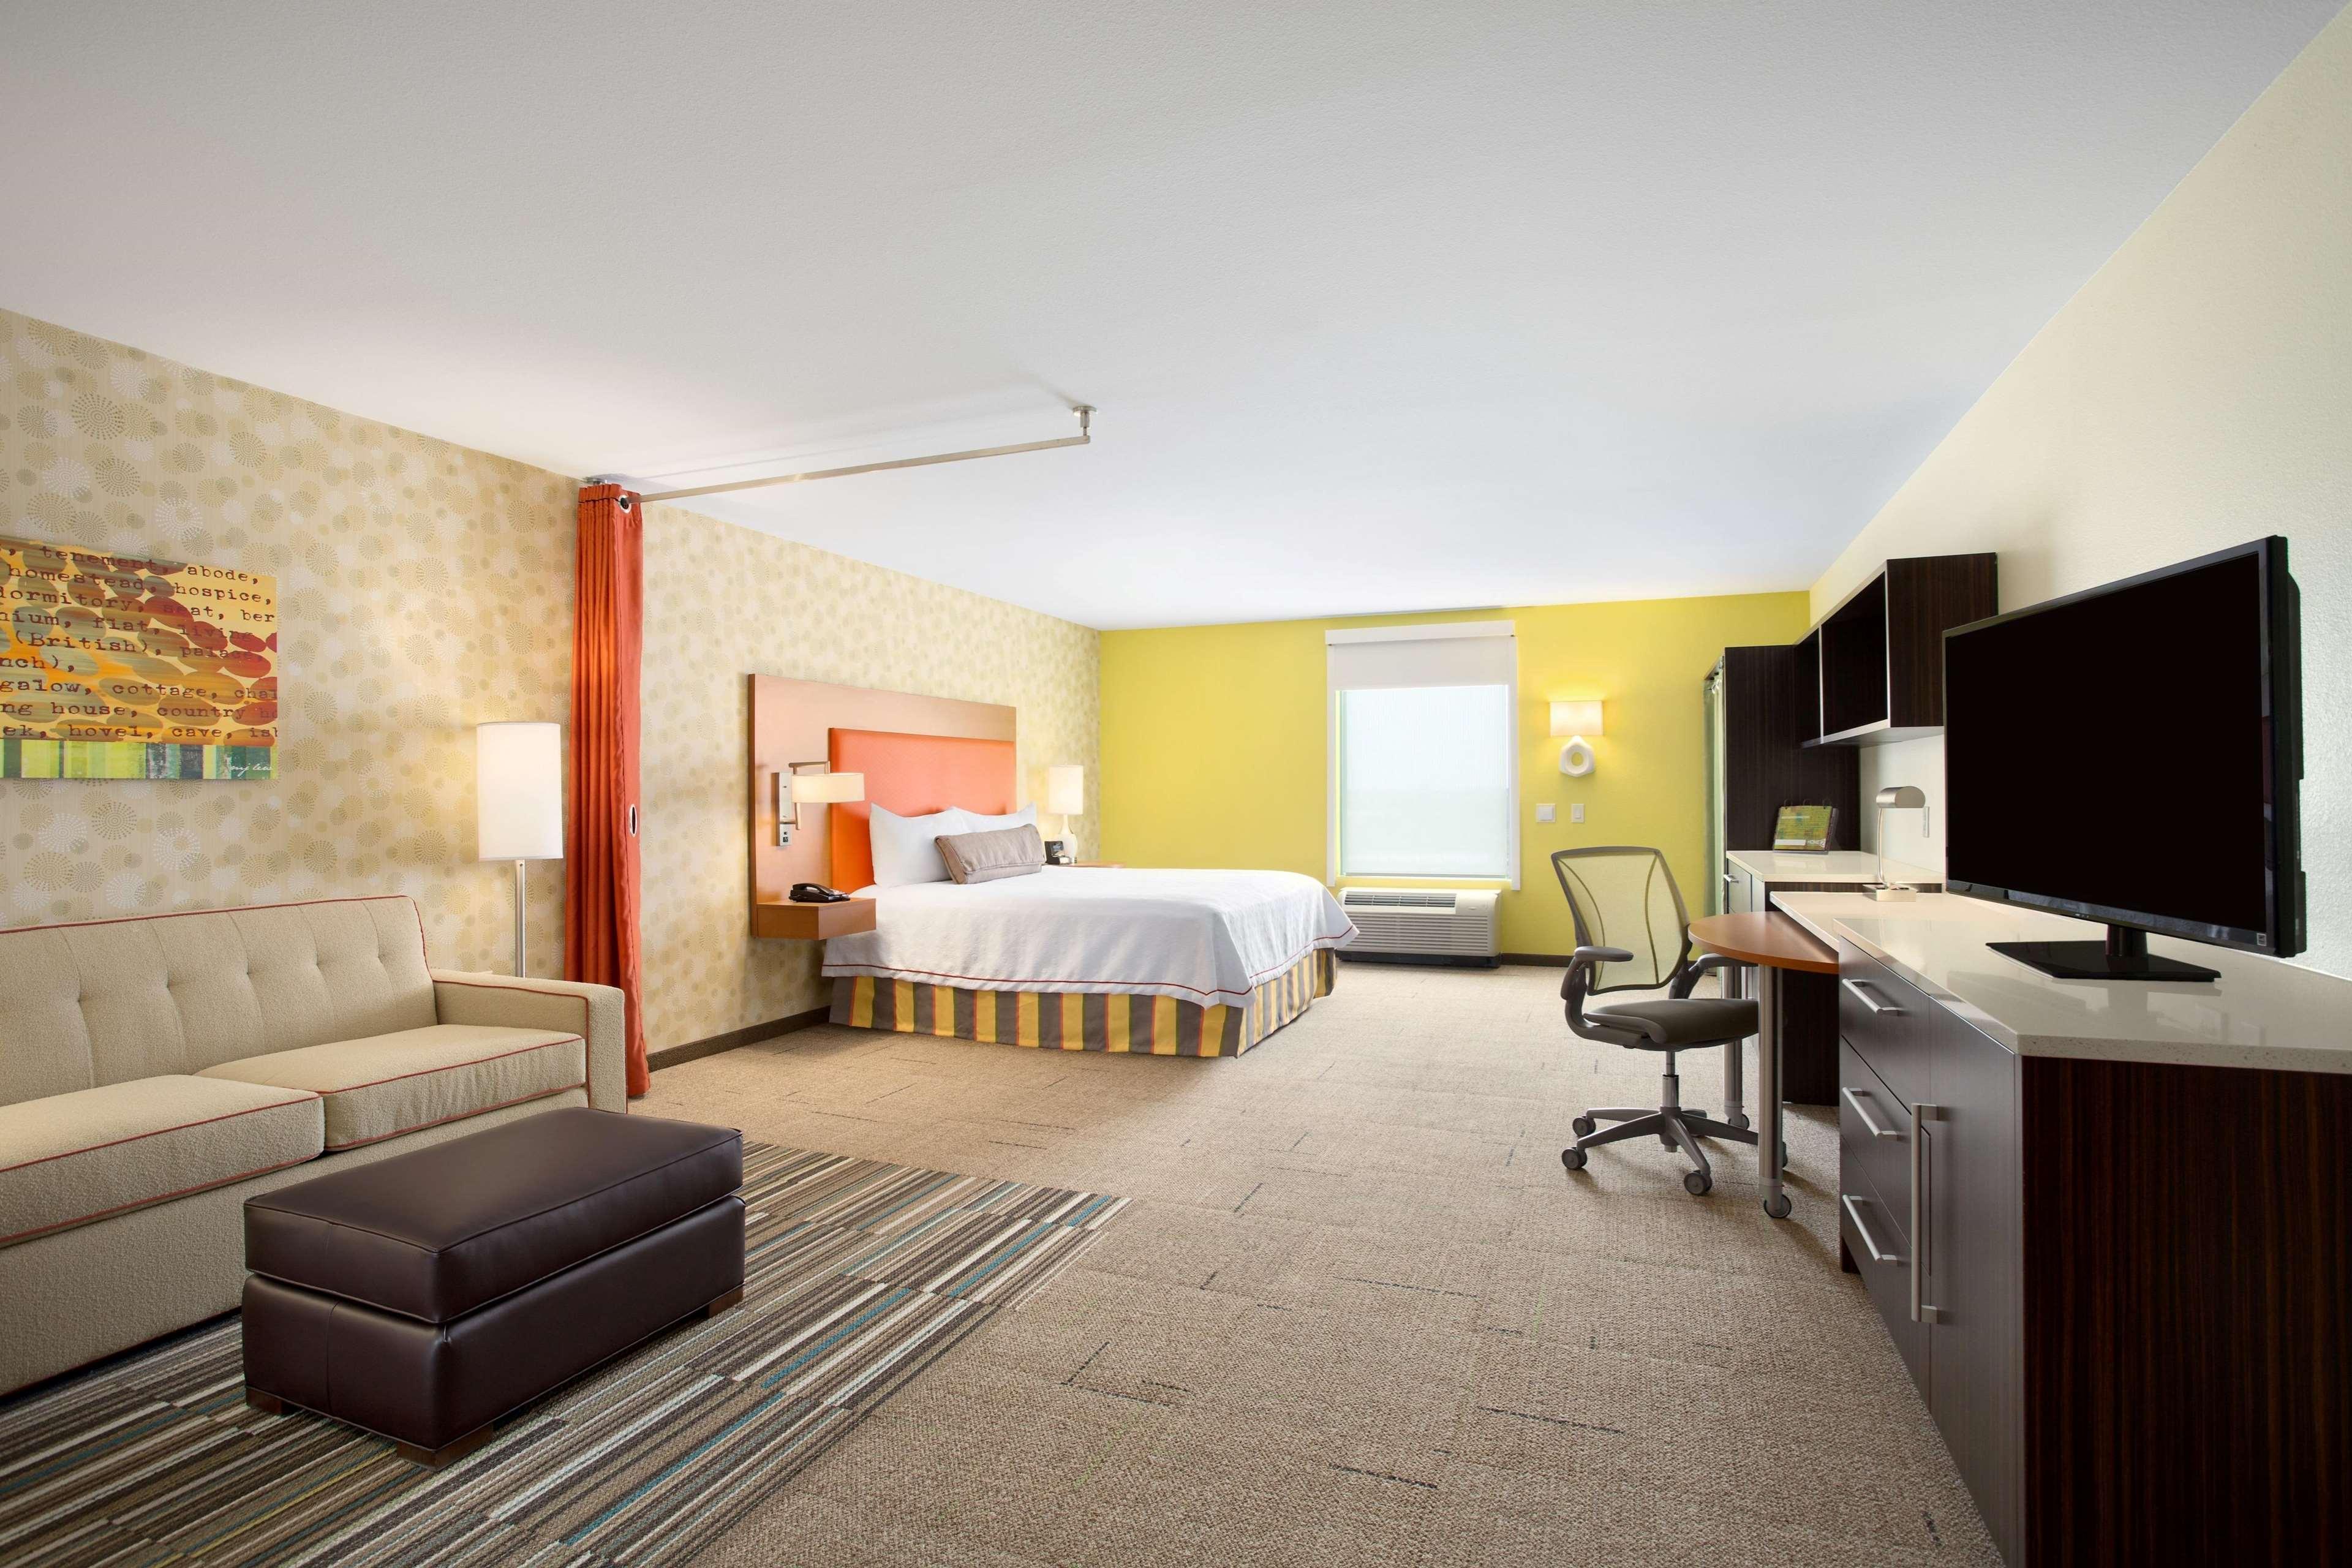 Home2 Suites by Hilton San Antonio Airport, TX image 17